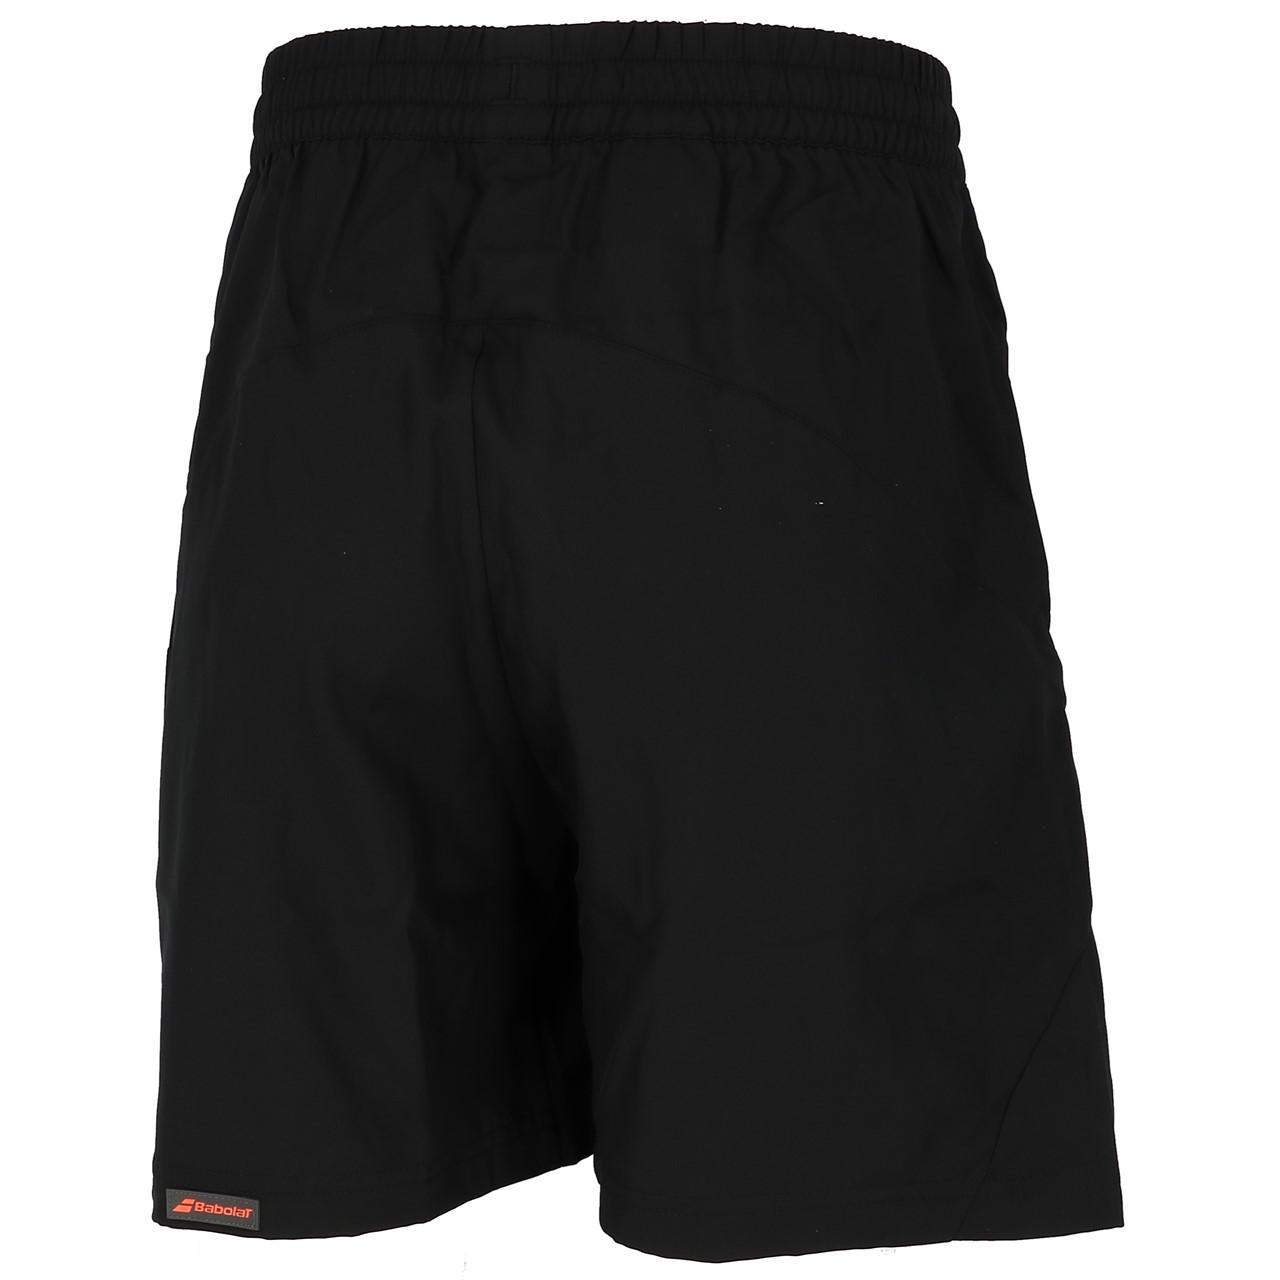 short-Tennis-Babolat-Core-Shorts-8-Men-Schwarz-Schwarz-71700-Neu Indexbild 5